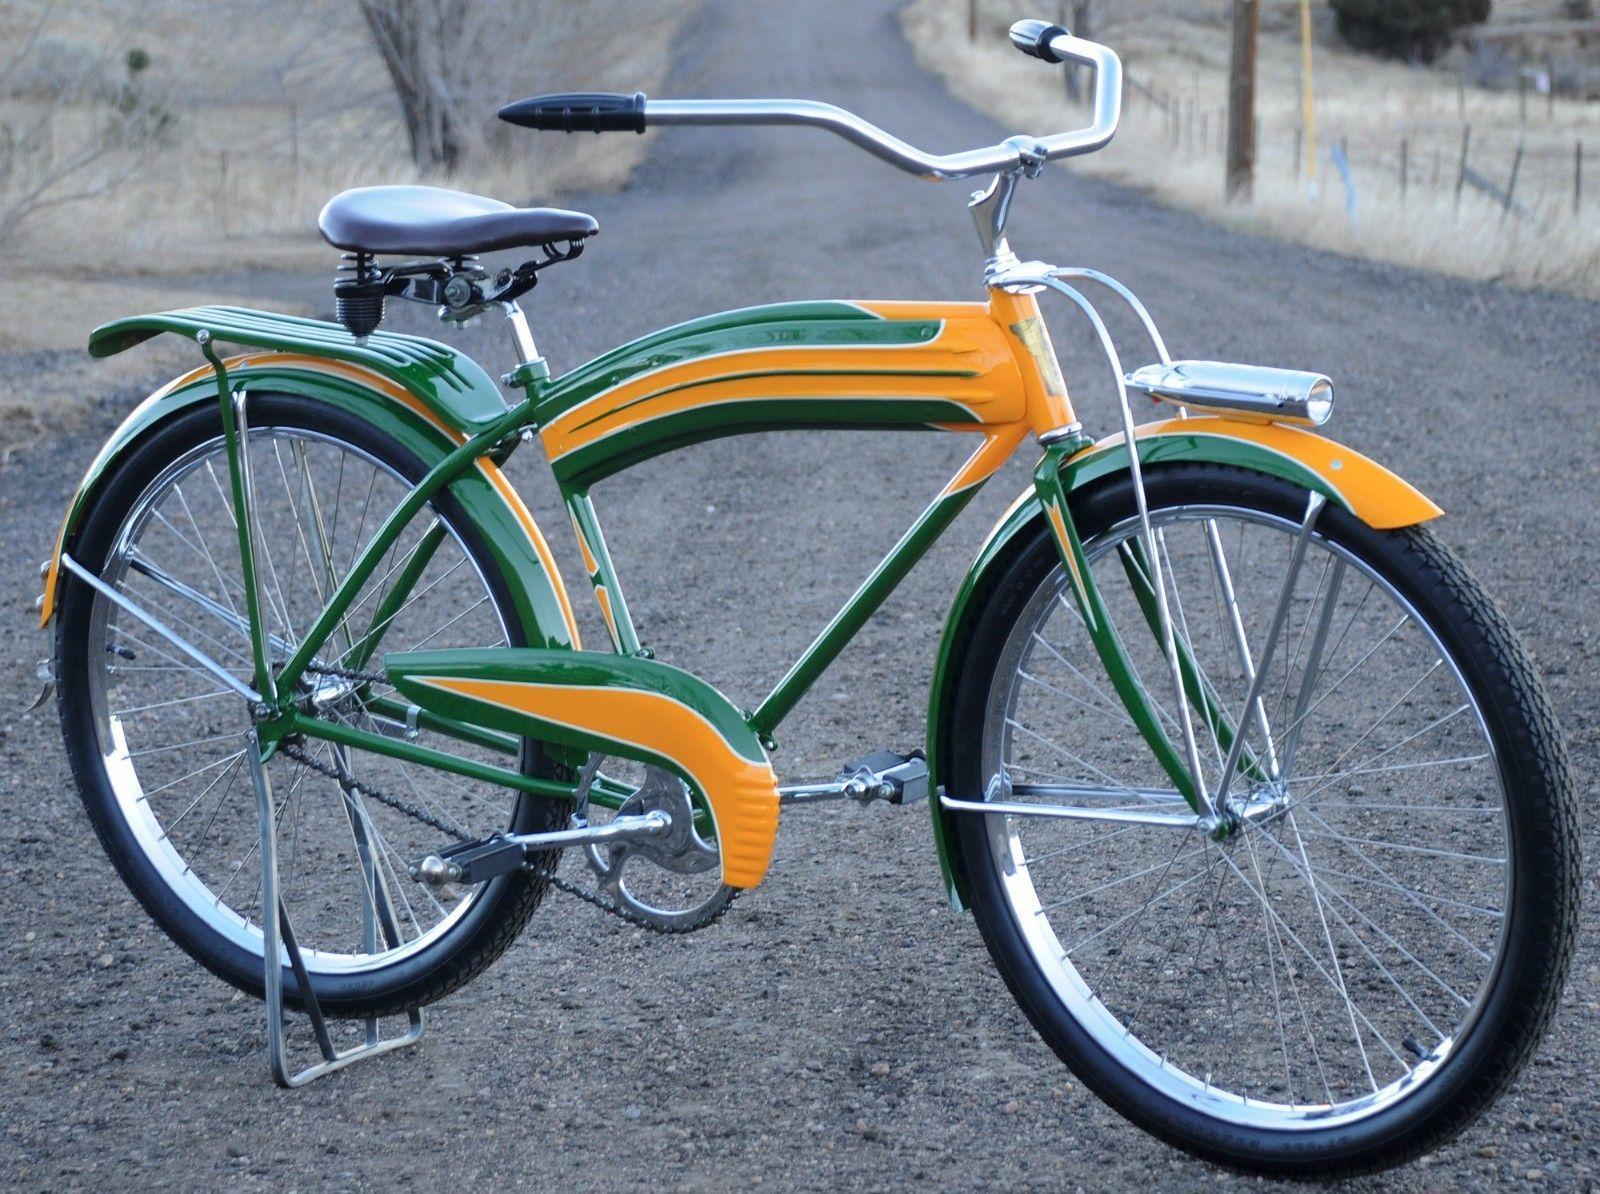 Beautiful 1940 Vintage Colson Flyer Cruiser Tank Bicycle Prewar Bike Schwinn QL